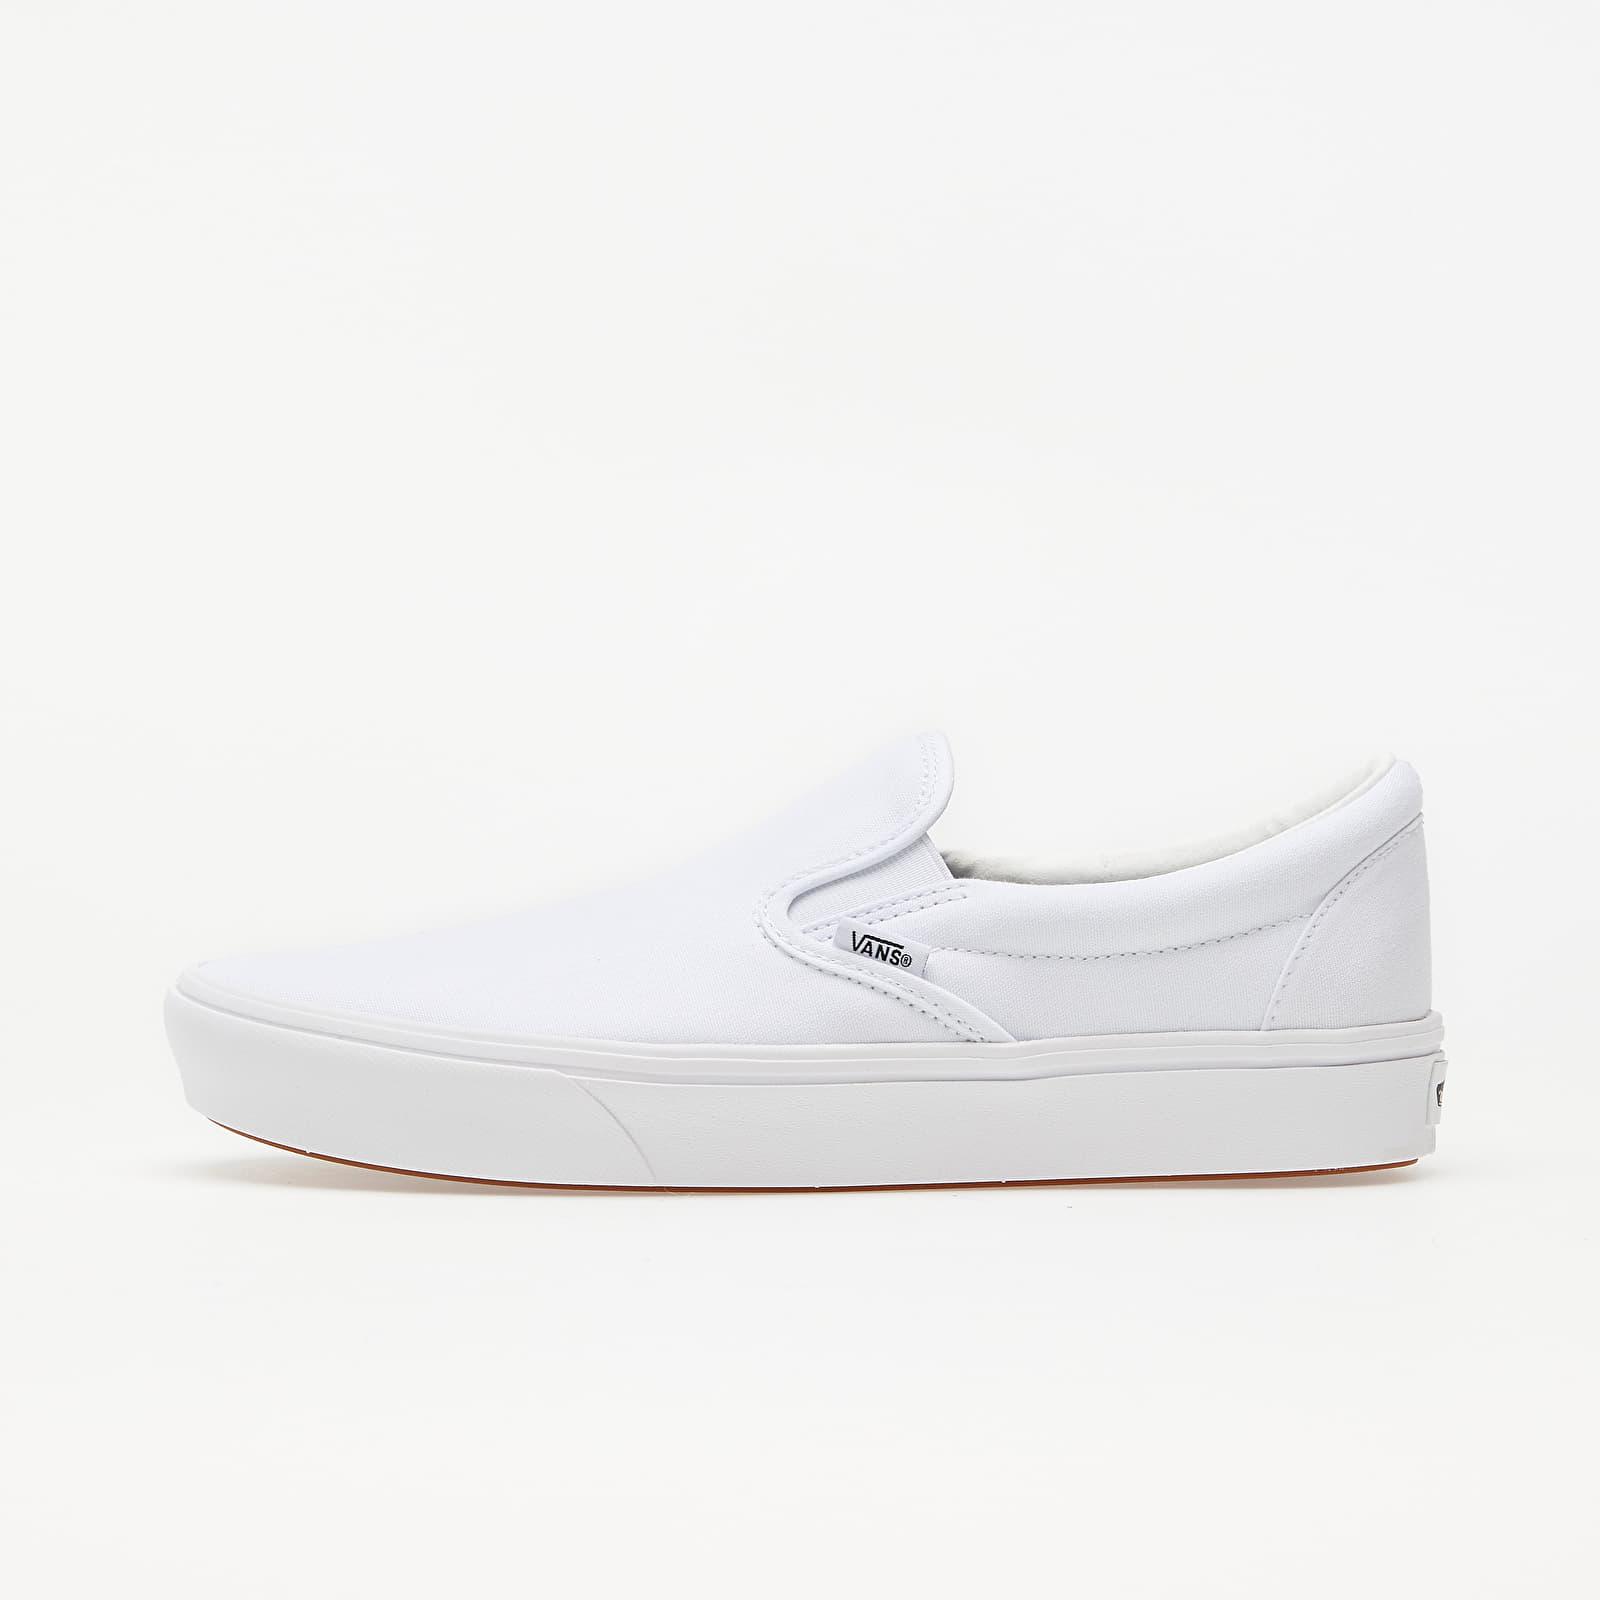 Pánské tenisky a boty Vans ComfyCush Slip-On (Classic) True White/ True